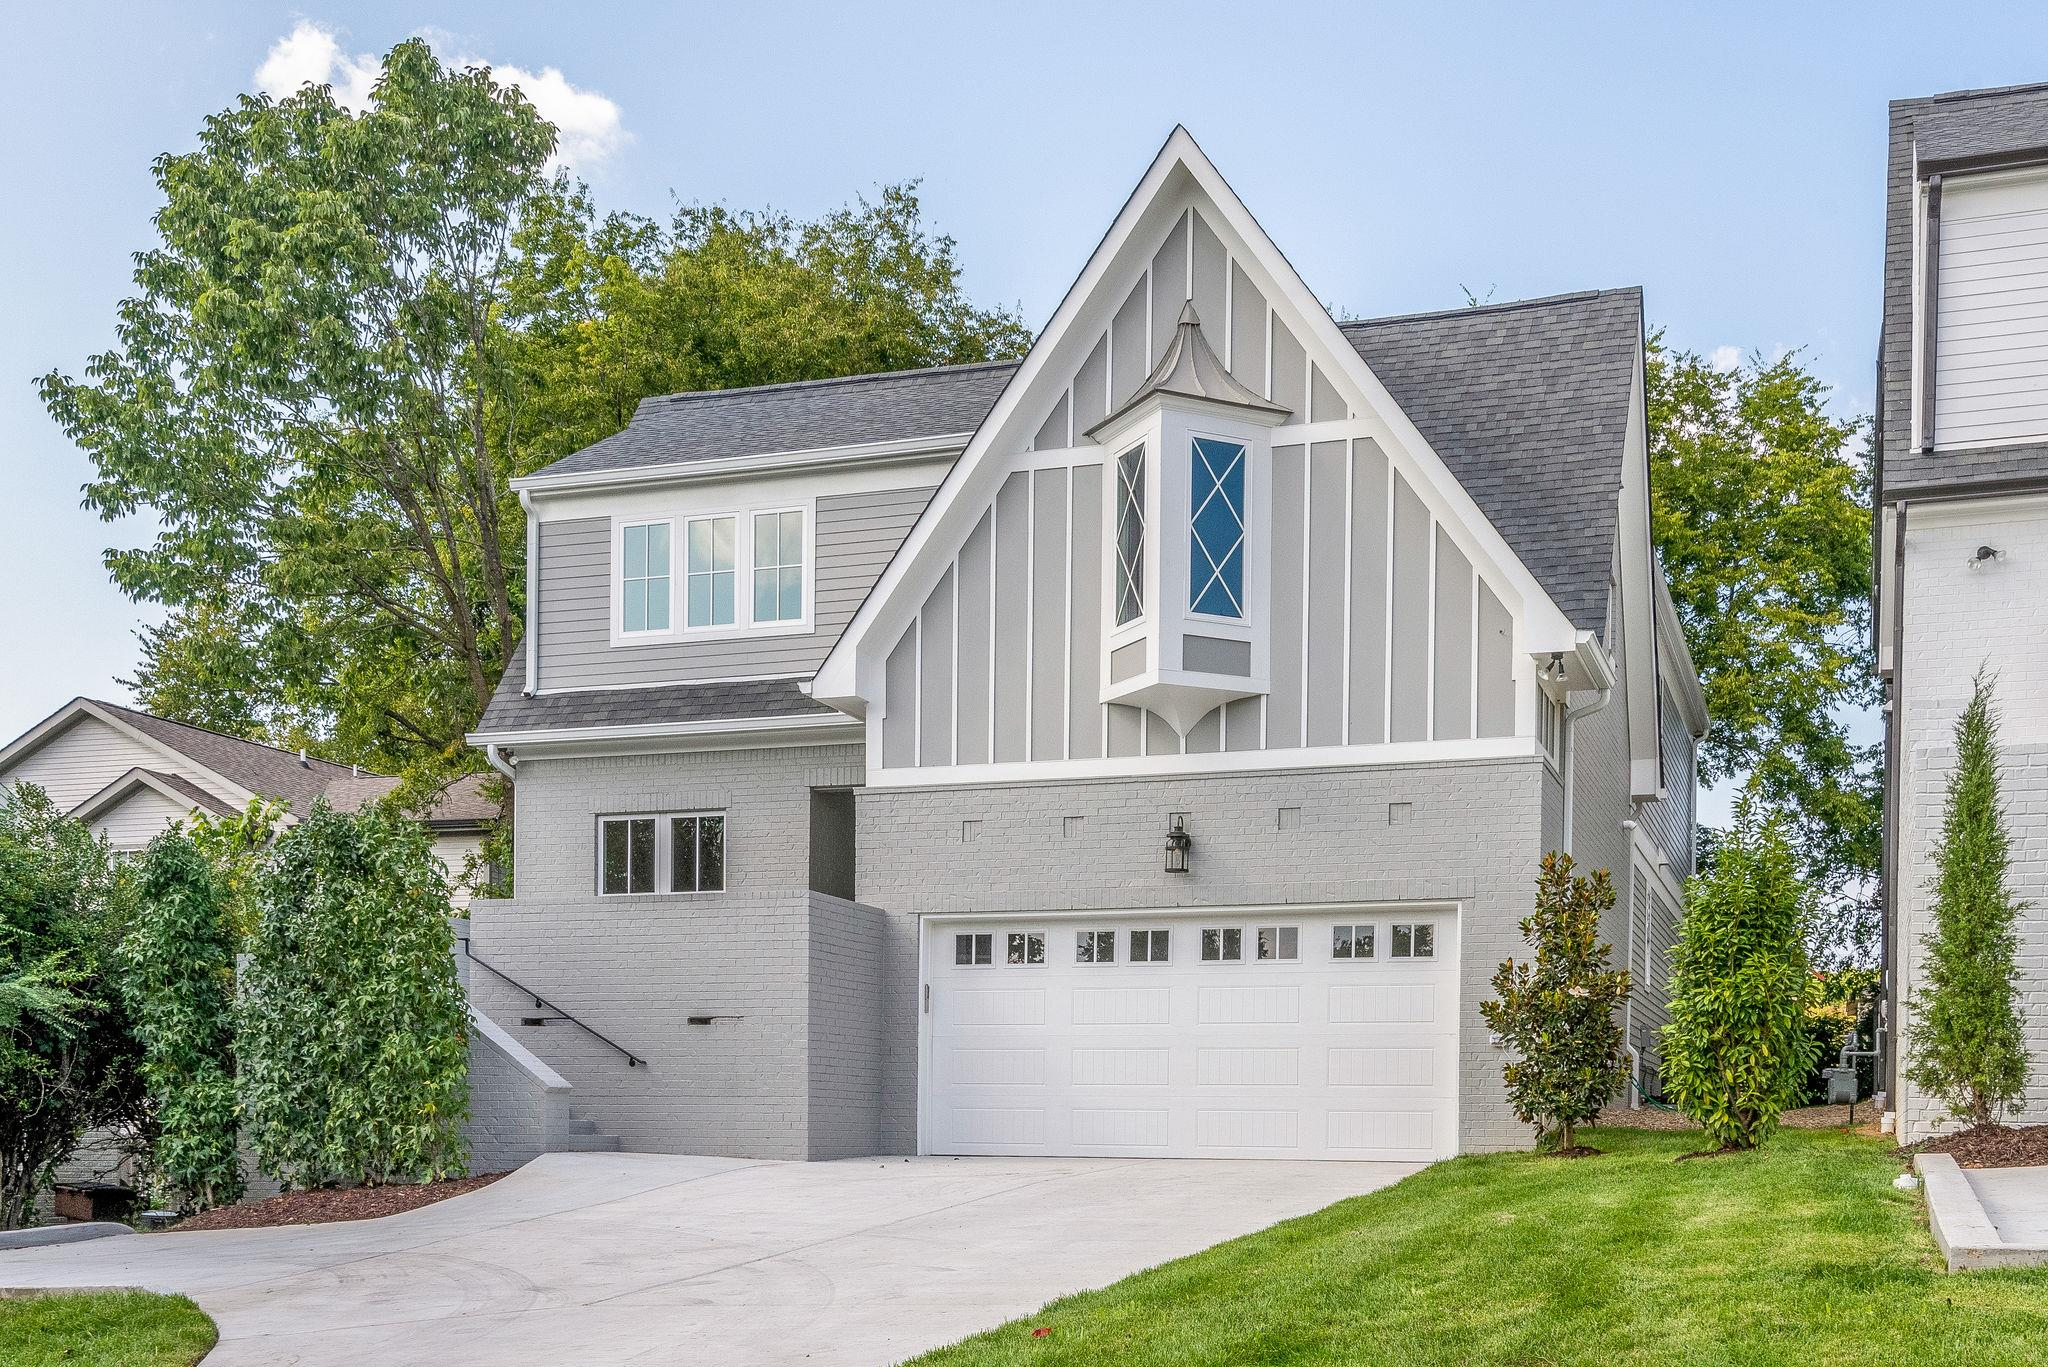 850 Sutton Hill Rd, Nashville, TN 37204 - Nashville, TN real estate listing